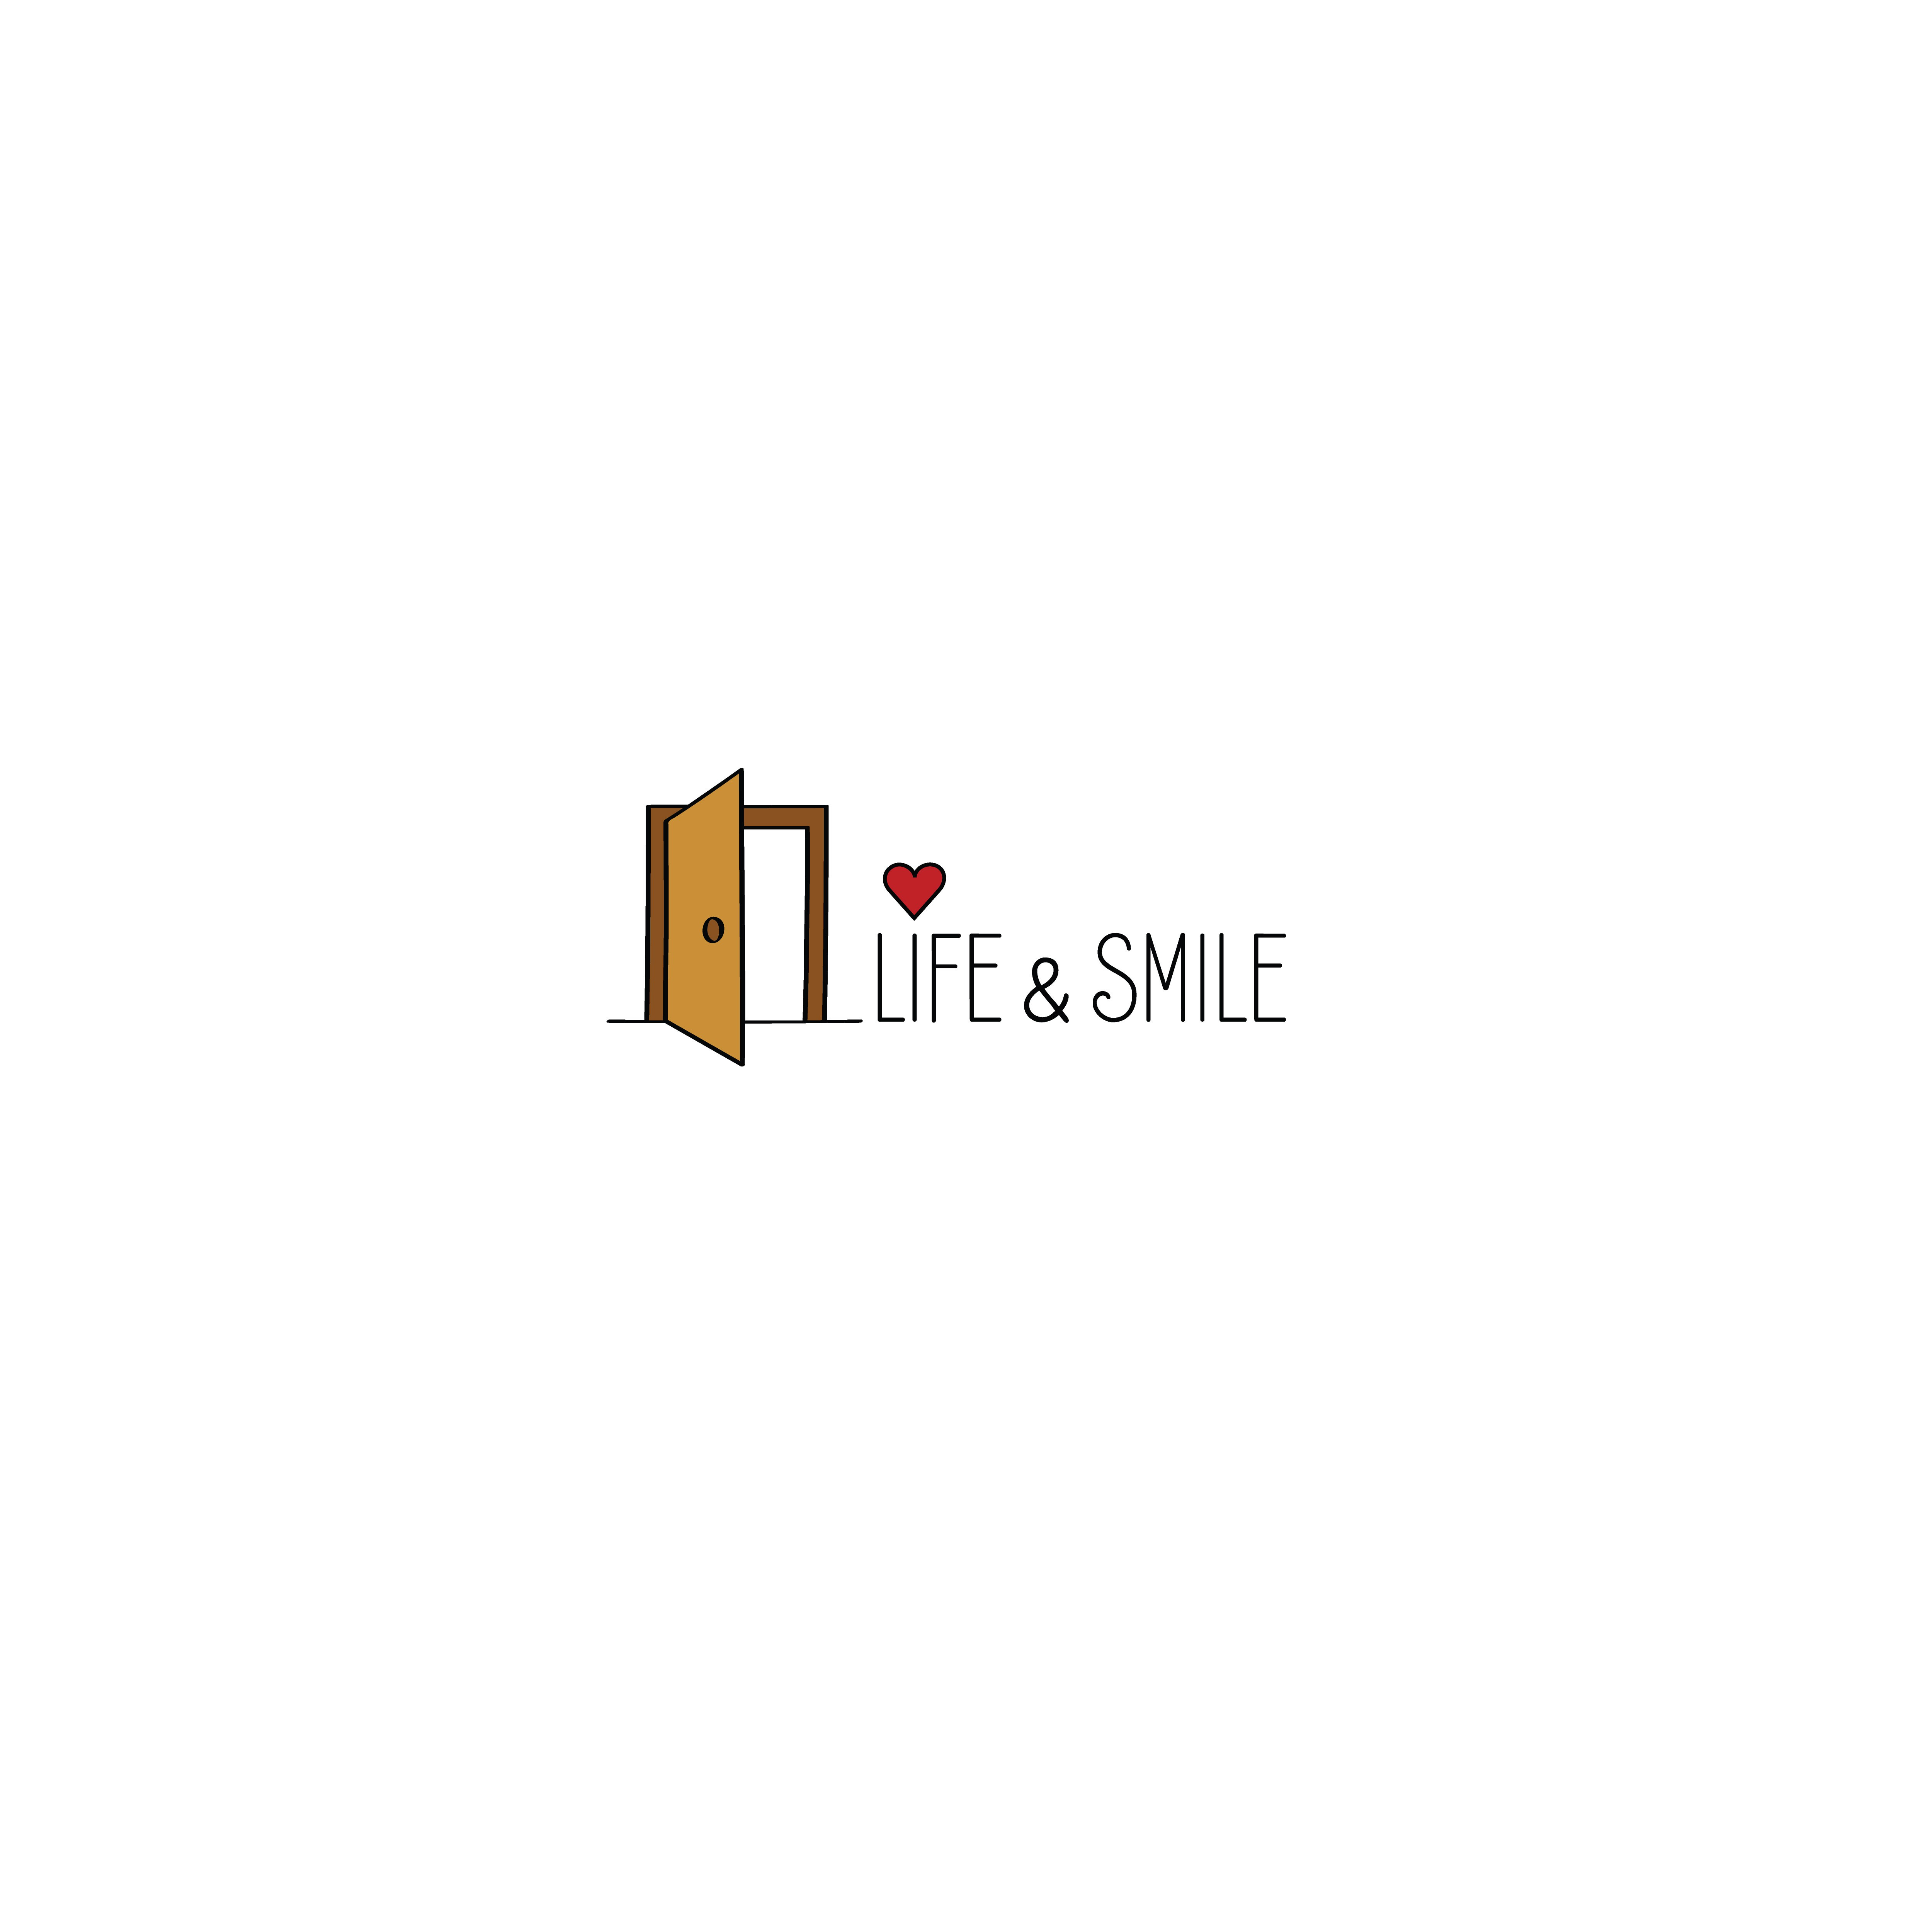 Life & Smile - An charity needs an inspiring logo